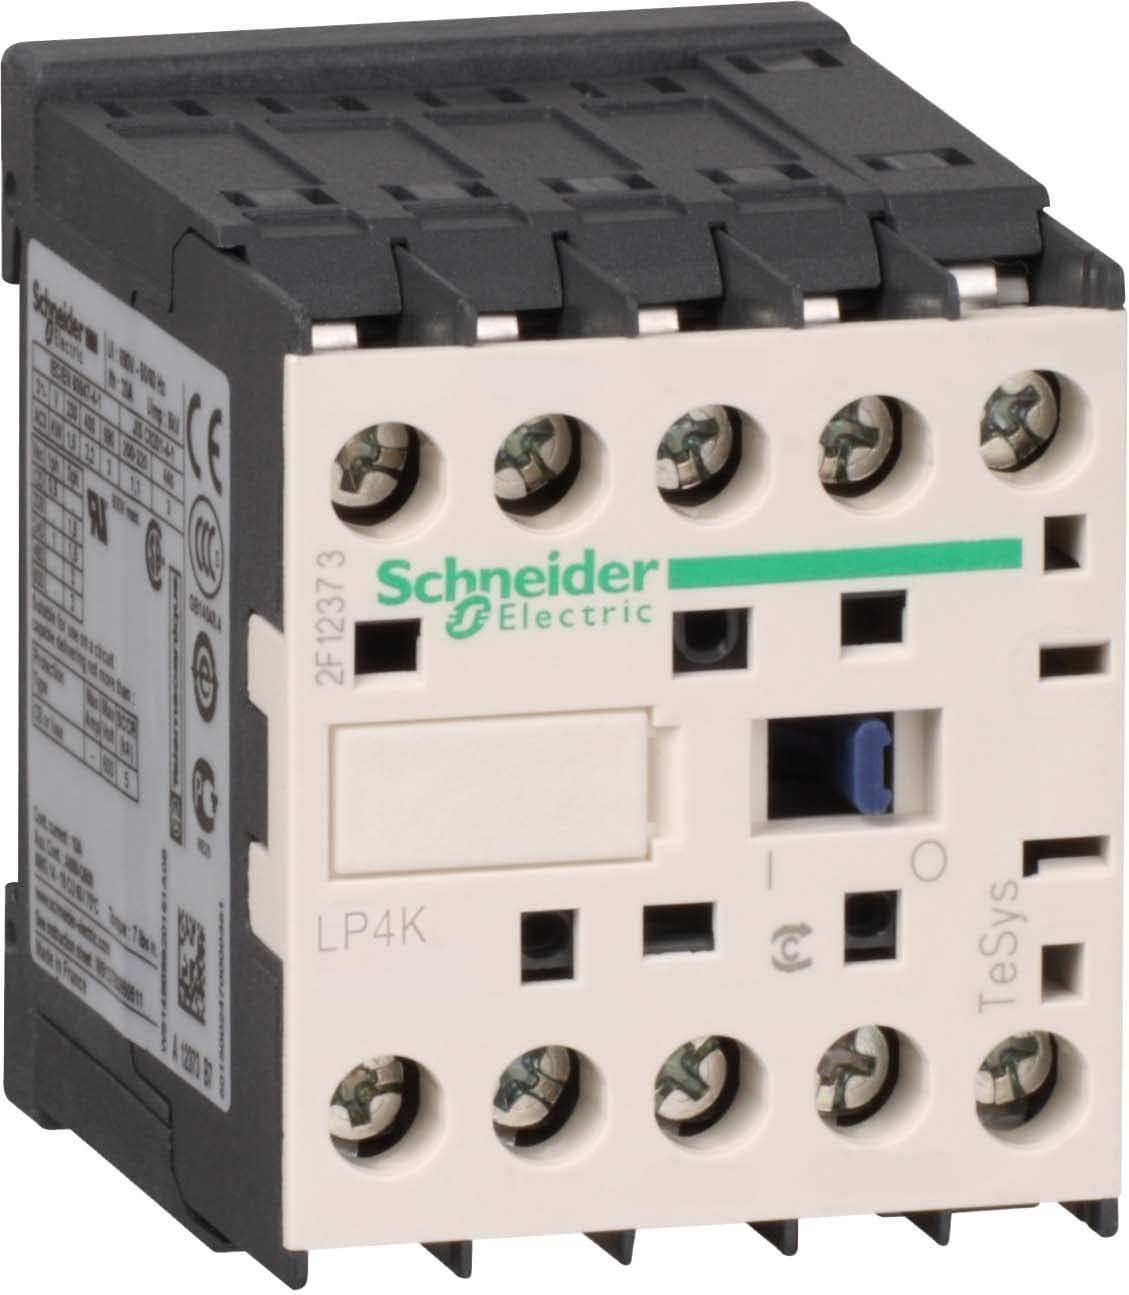 Schneider Electric LP4K09015BW3 TeSys K Conector, 3P, 3NA, AC-3 - <= 440V 9A - 24V Bobina CC, 58mm x 45mm x 57mm